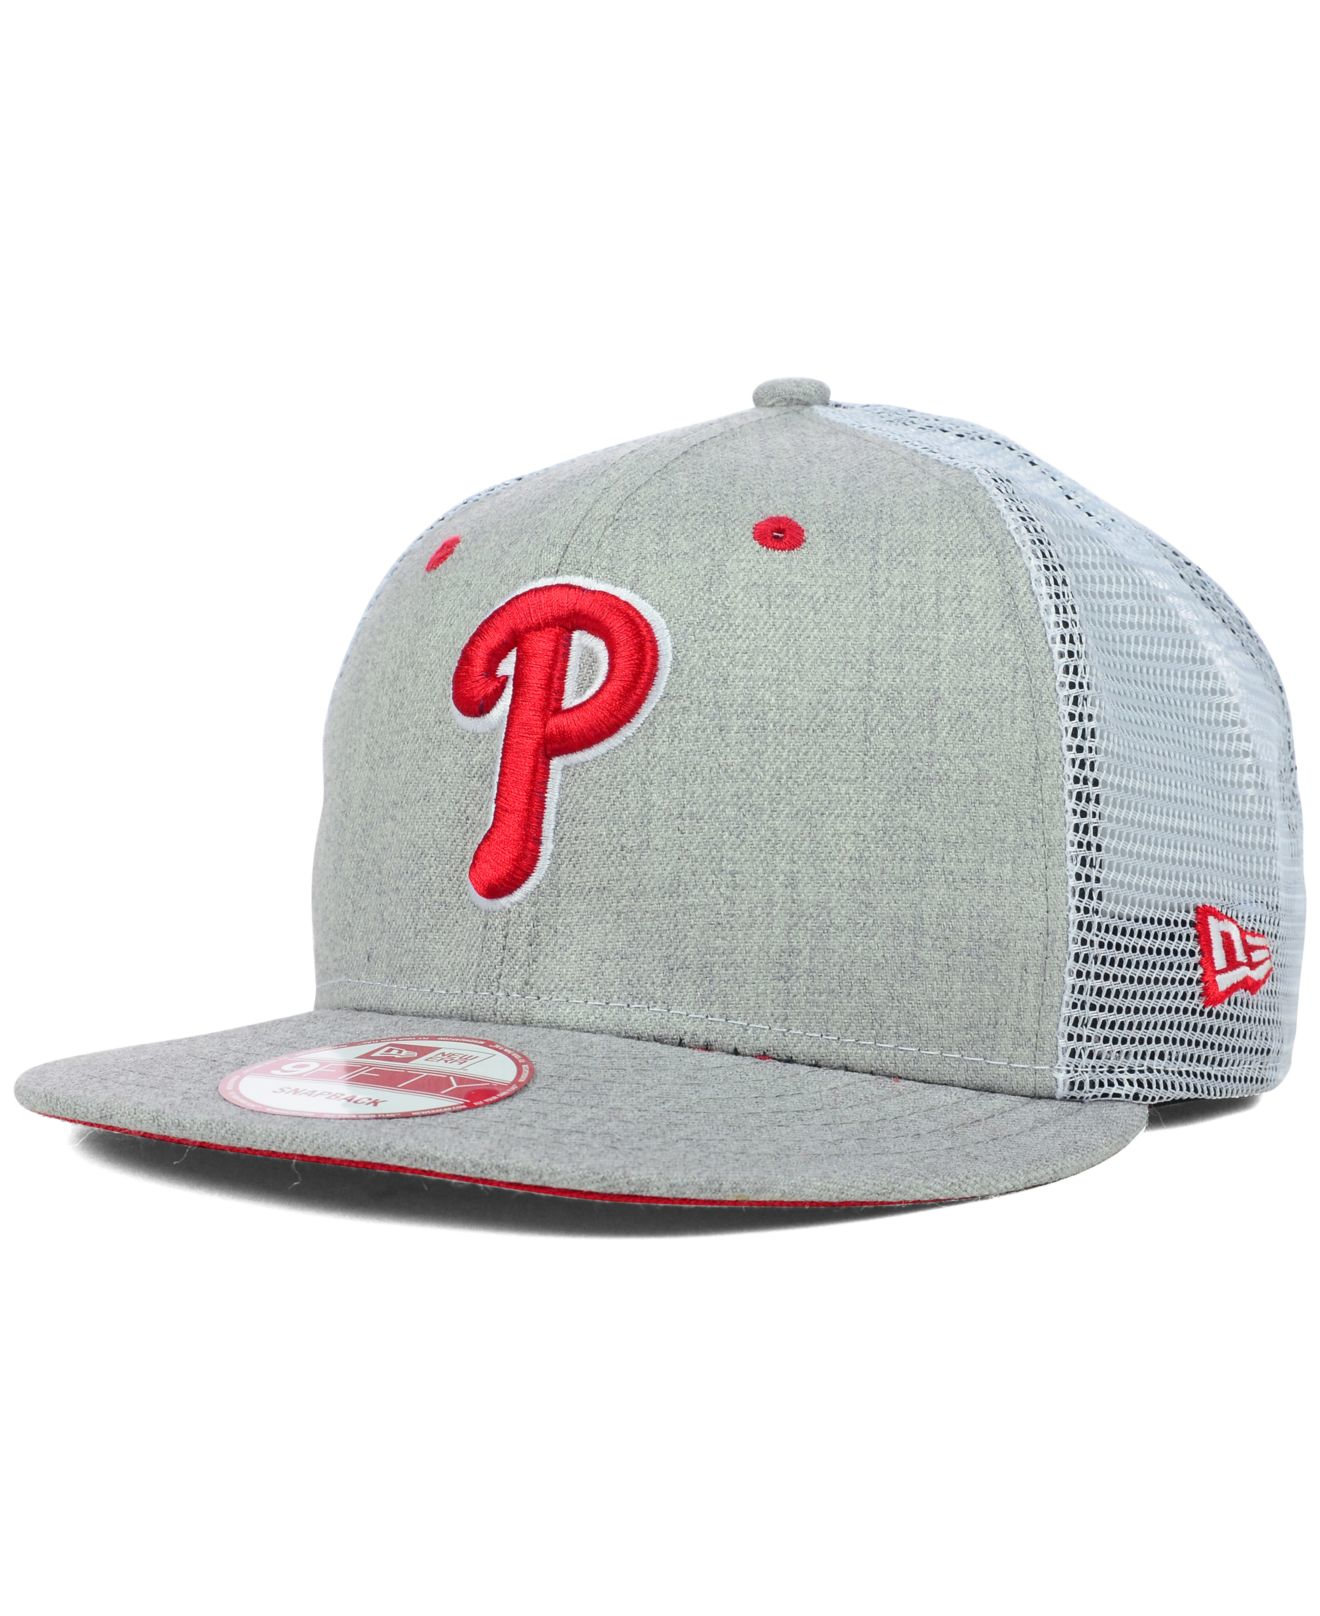 ca21e8adf0ac4 KTZ Philadelphia Phillies Heather Trucker 9fifty Snapback Cap in ...